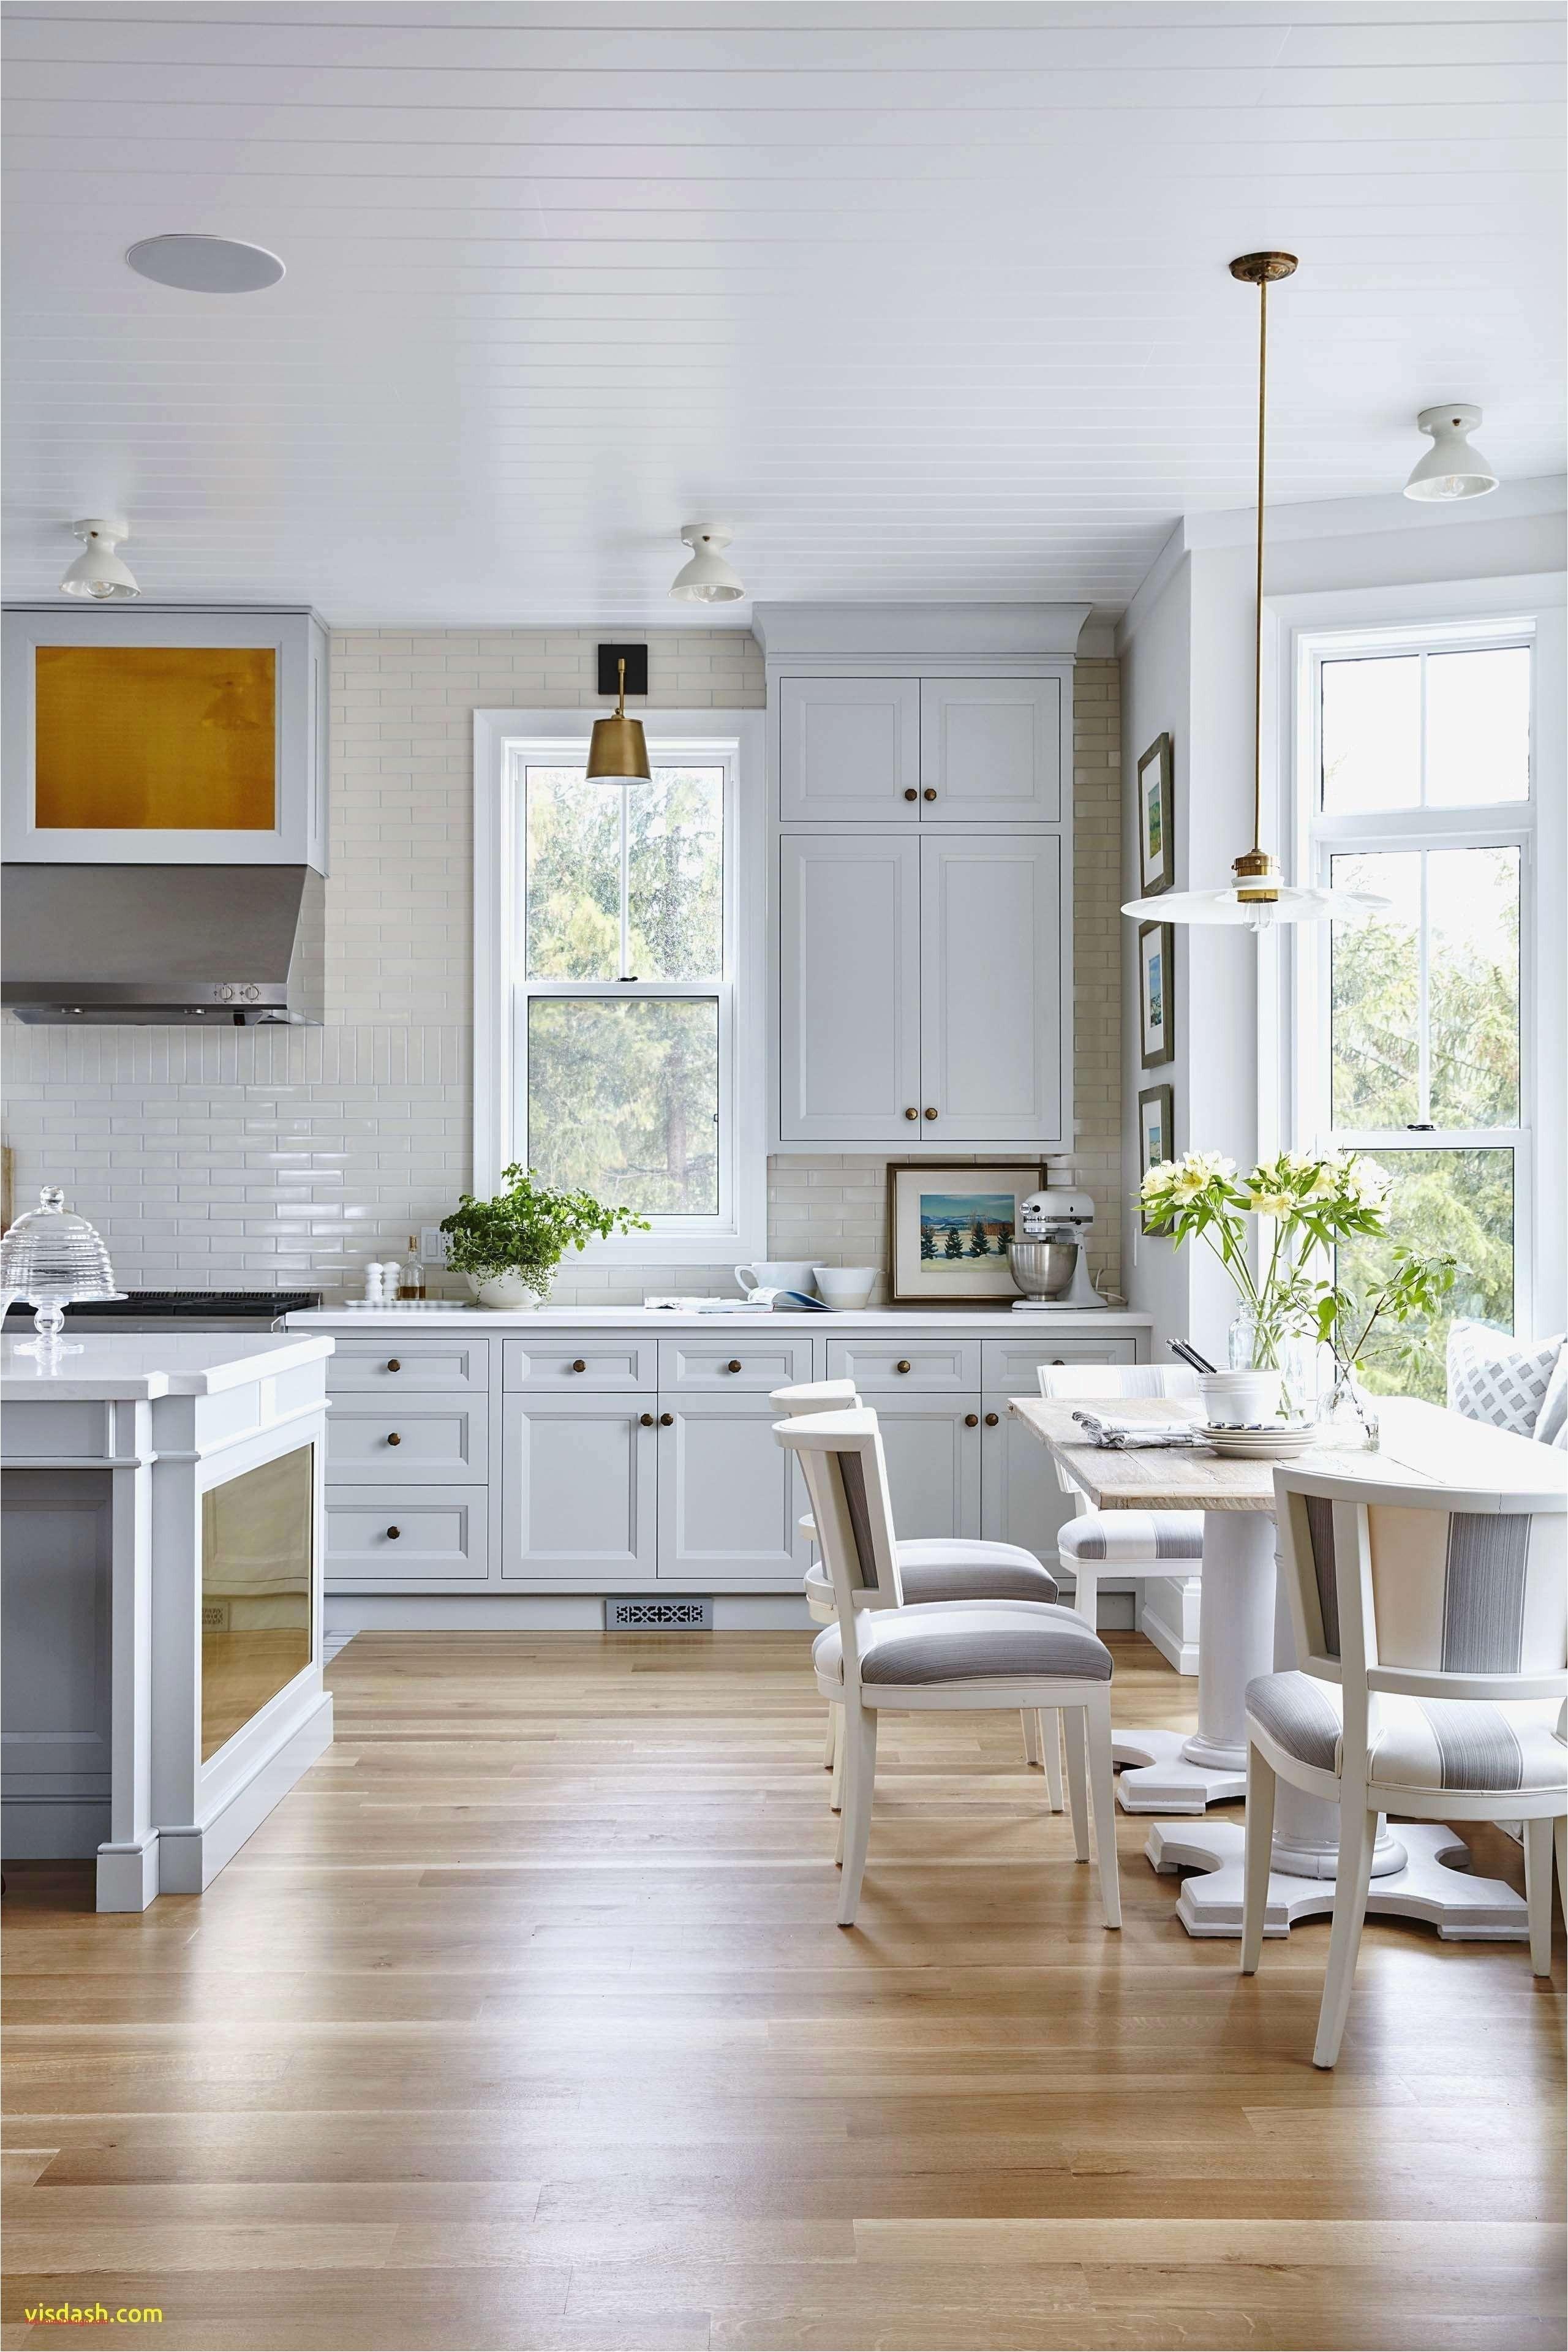 Bathroom White Tiles New Home Tile Design Ideas Valid Floor Tiles Mosaic Bathroom 0d New